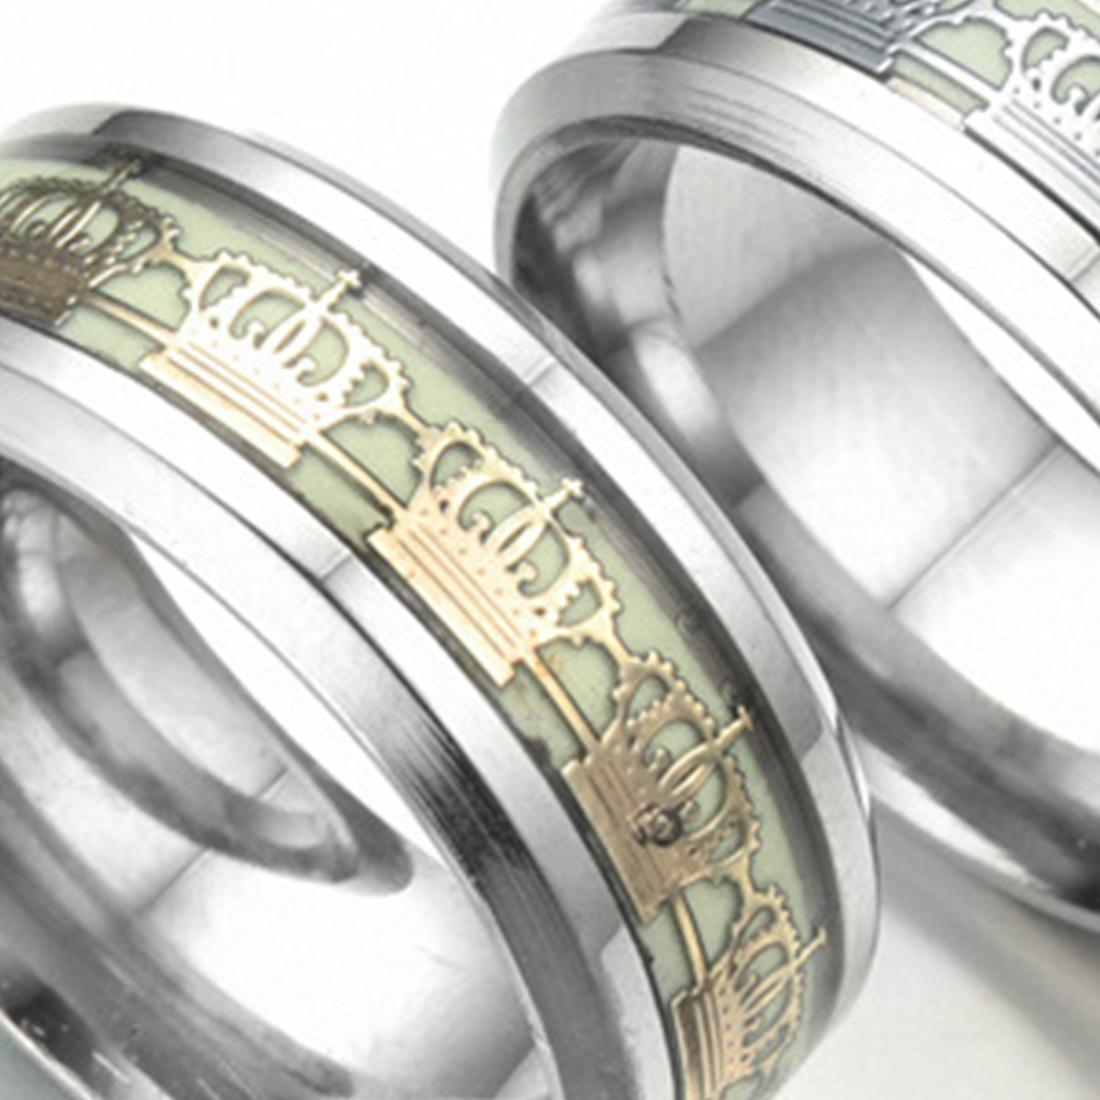 HOT Luminous Fluorescent Ring Crown Ring Stainless Steel  Personality Original JewelryJewelry Women Men Wild Ring 8mm